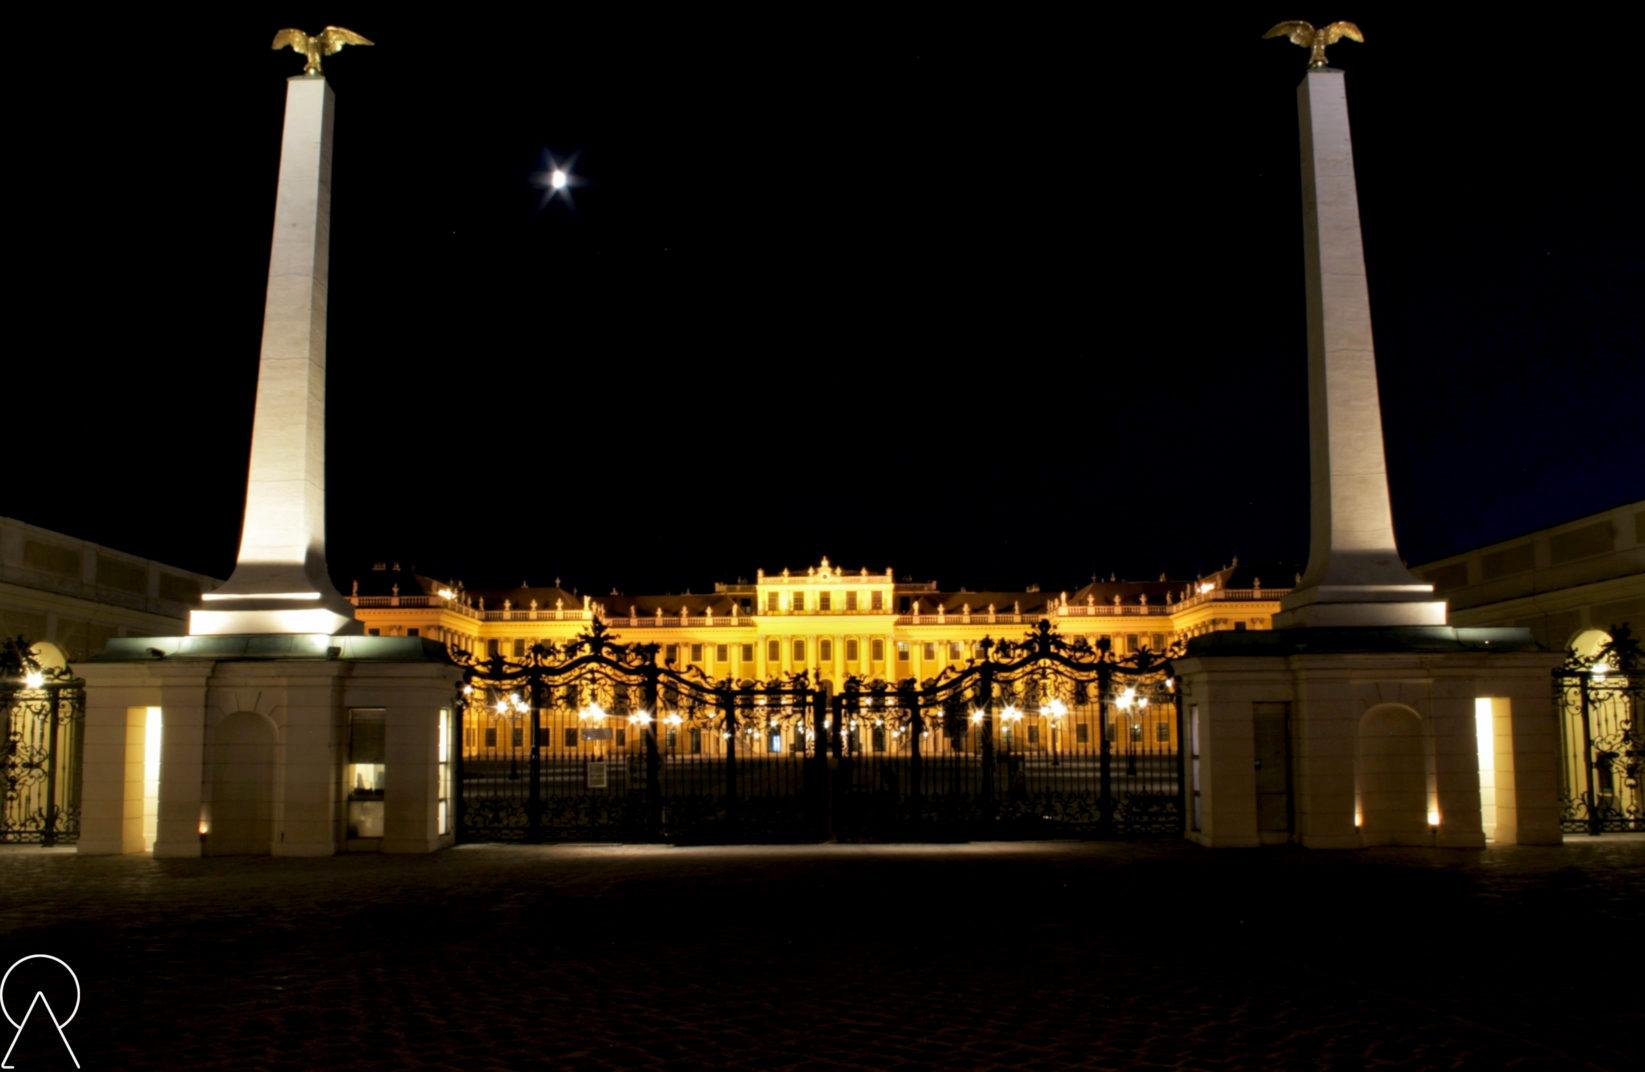 Wiedeń - Pałac Schönbrunn